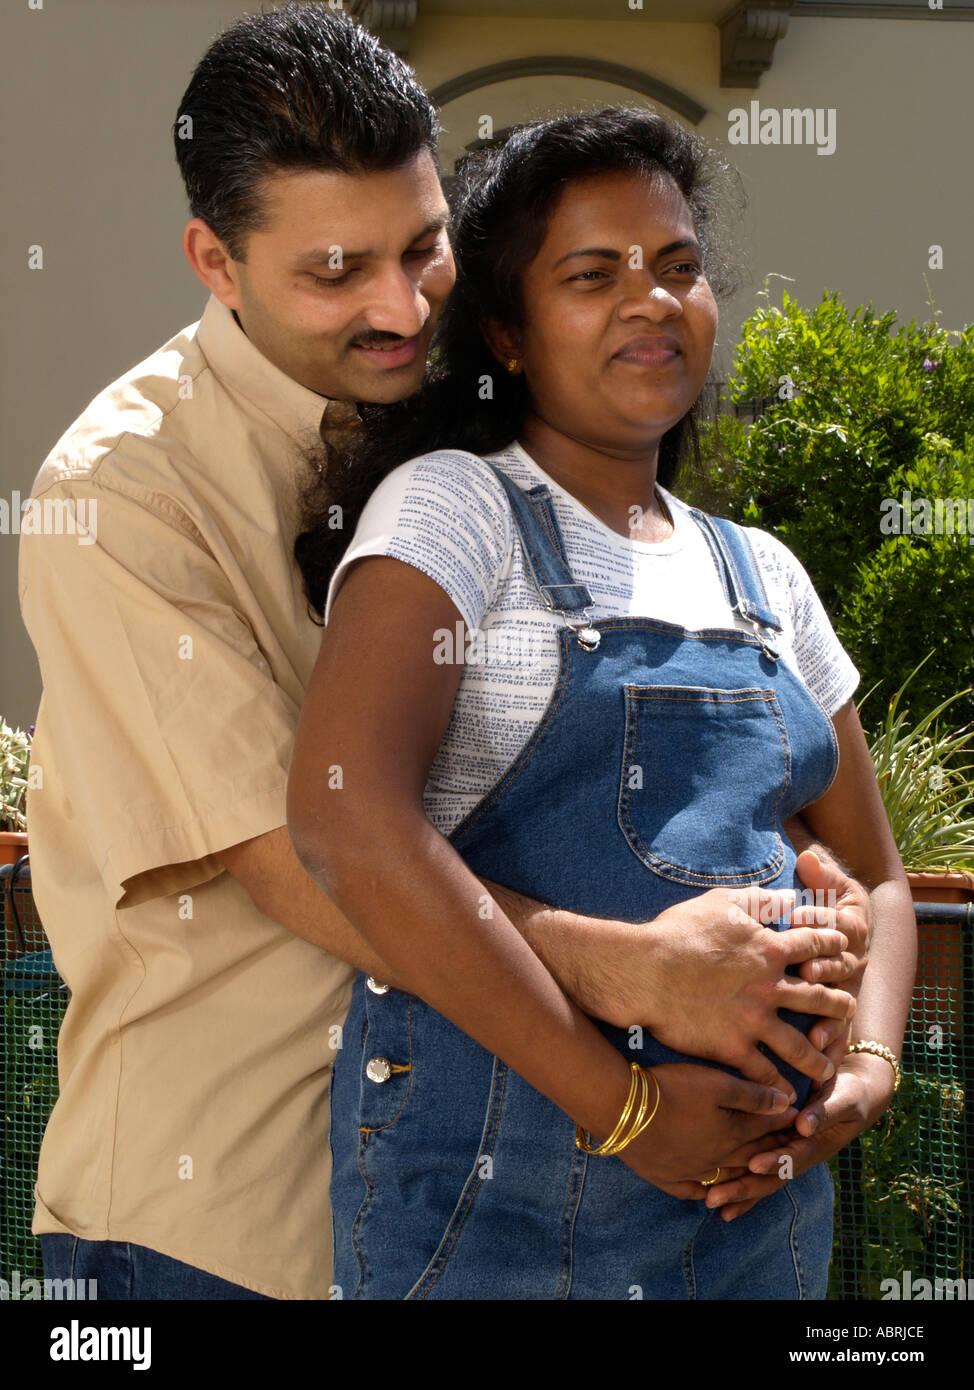 Sri lankan pregnant 6 months shaved 9